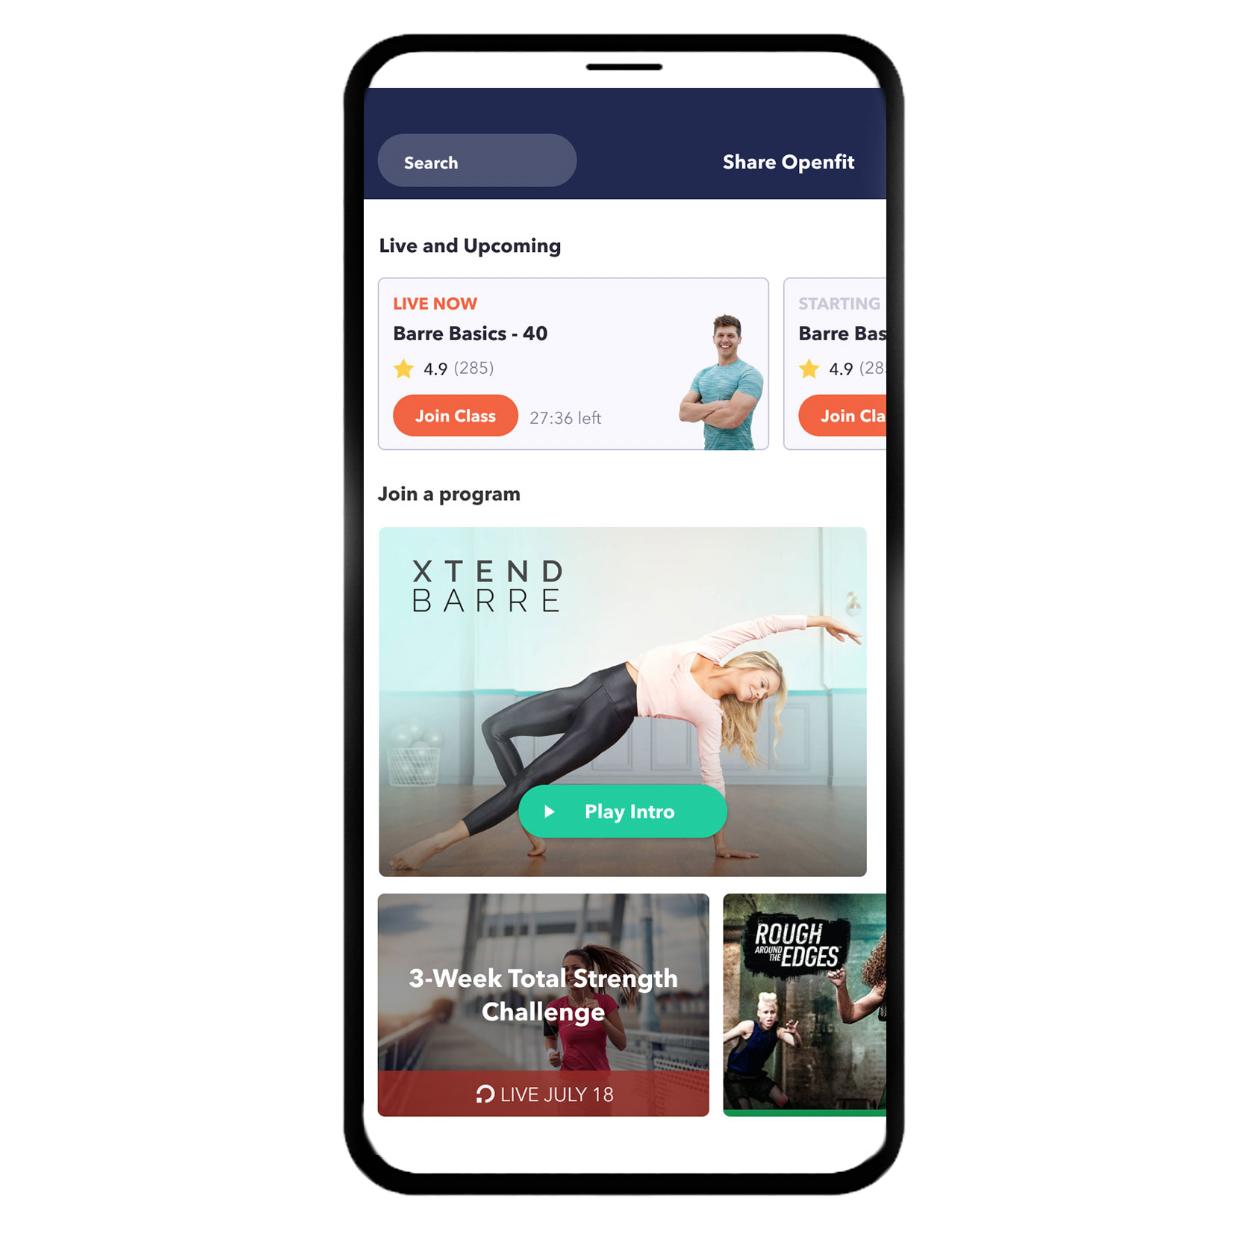 openfit app - in screen grab